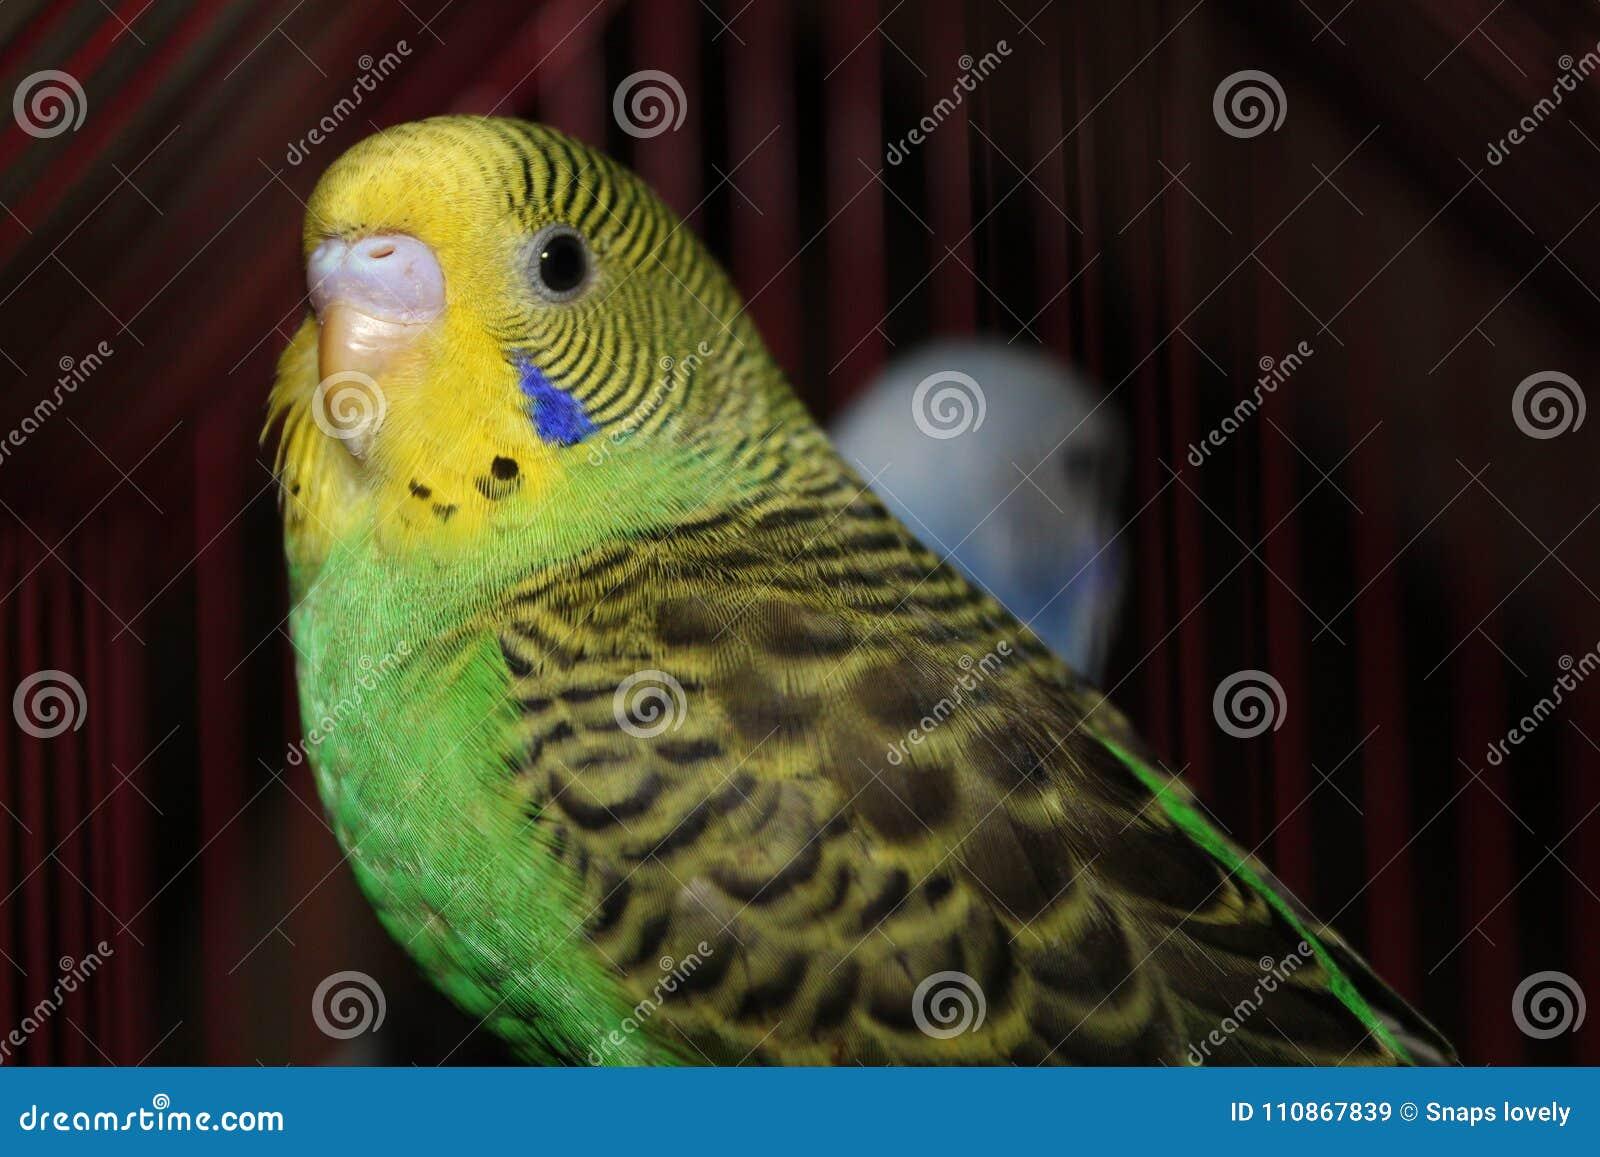 Lovebird Beautiful Yellow And Green Lovebird Posing At Camera Stock Image Image Of Images Lovebird 110867839